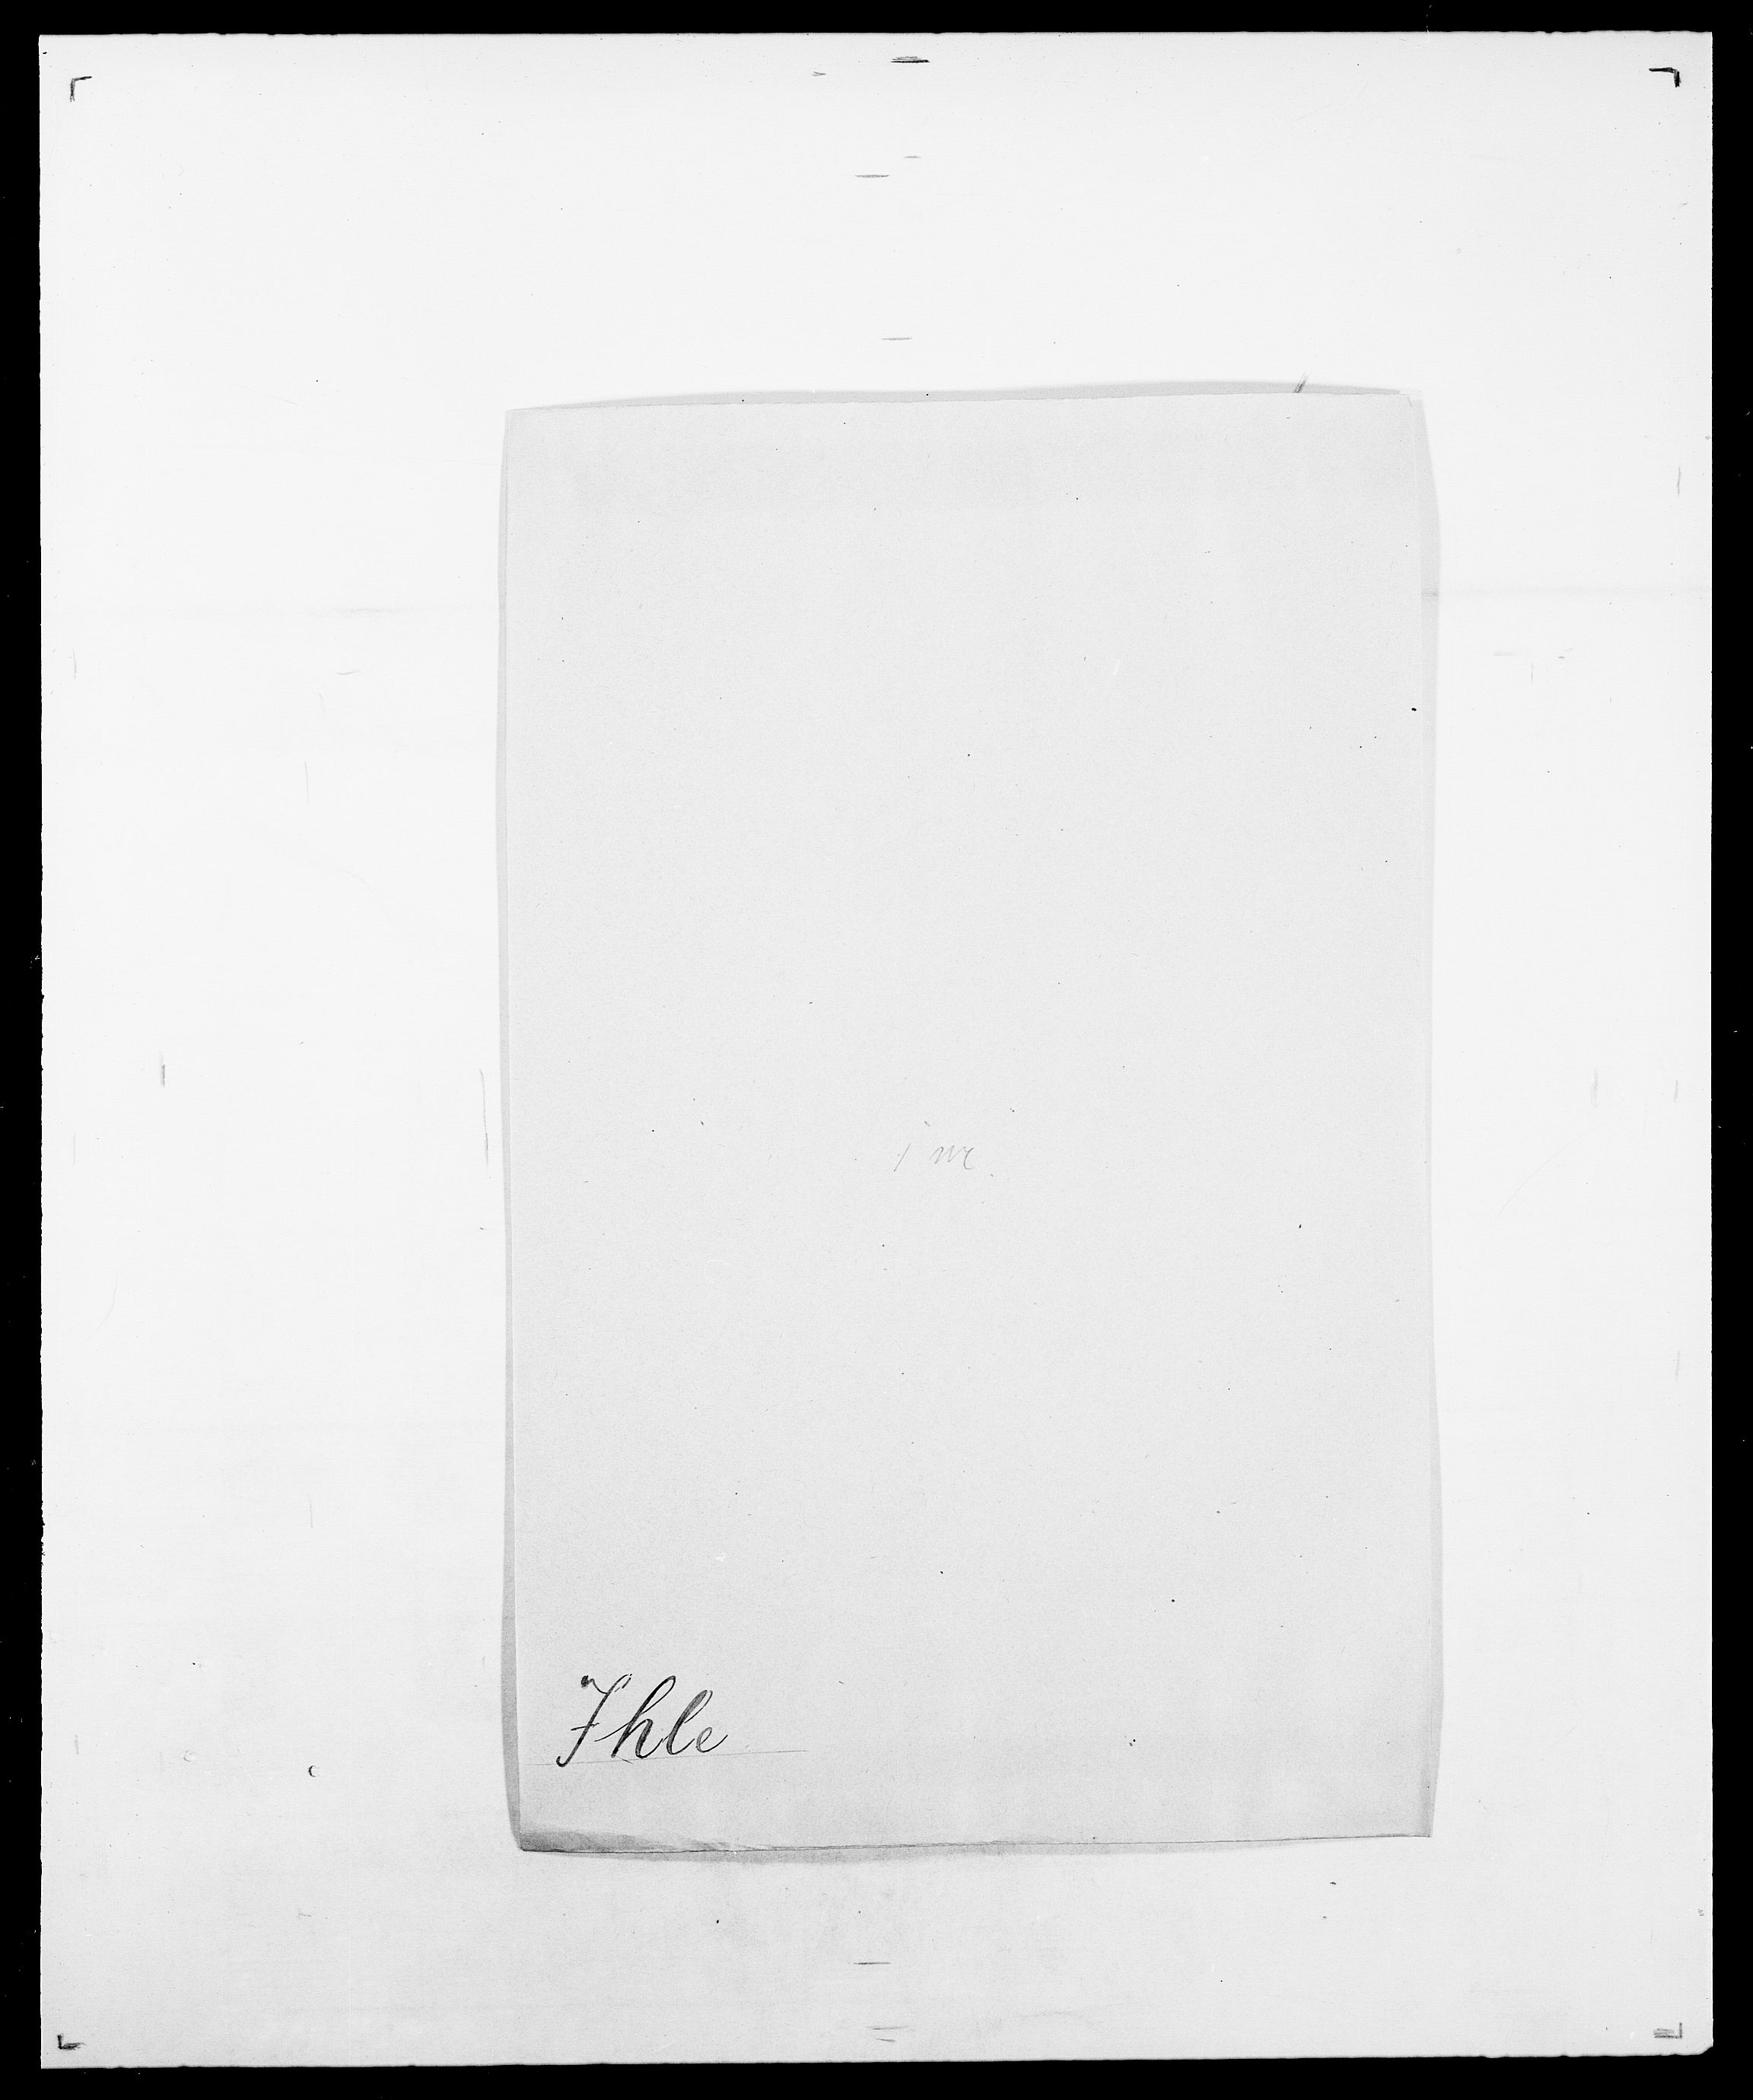 SAO, Delgobe, Charles Antoine - samling, D/Da/L0019: van der Hude - Joys, s. 759